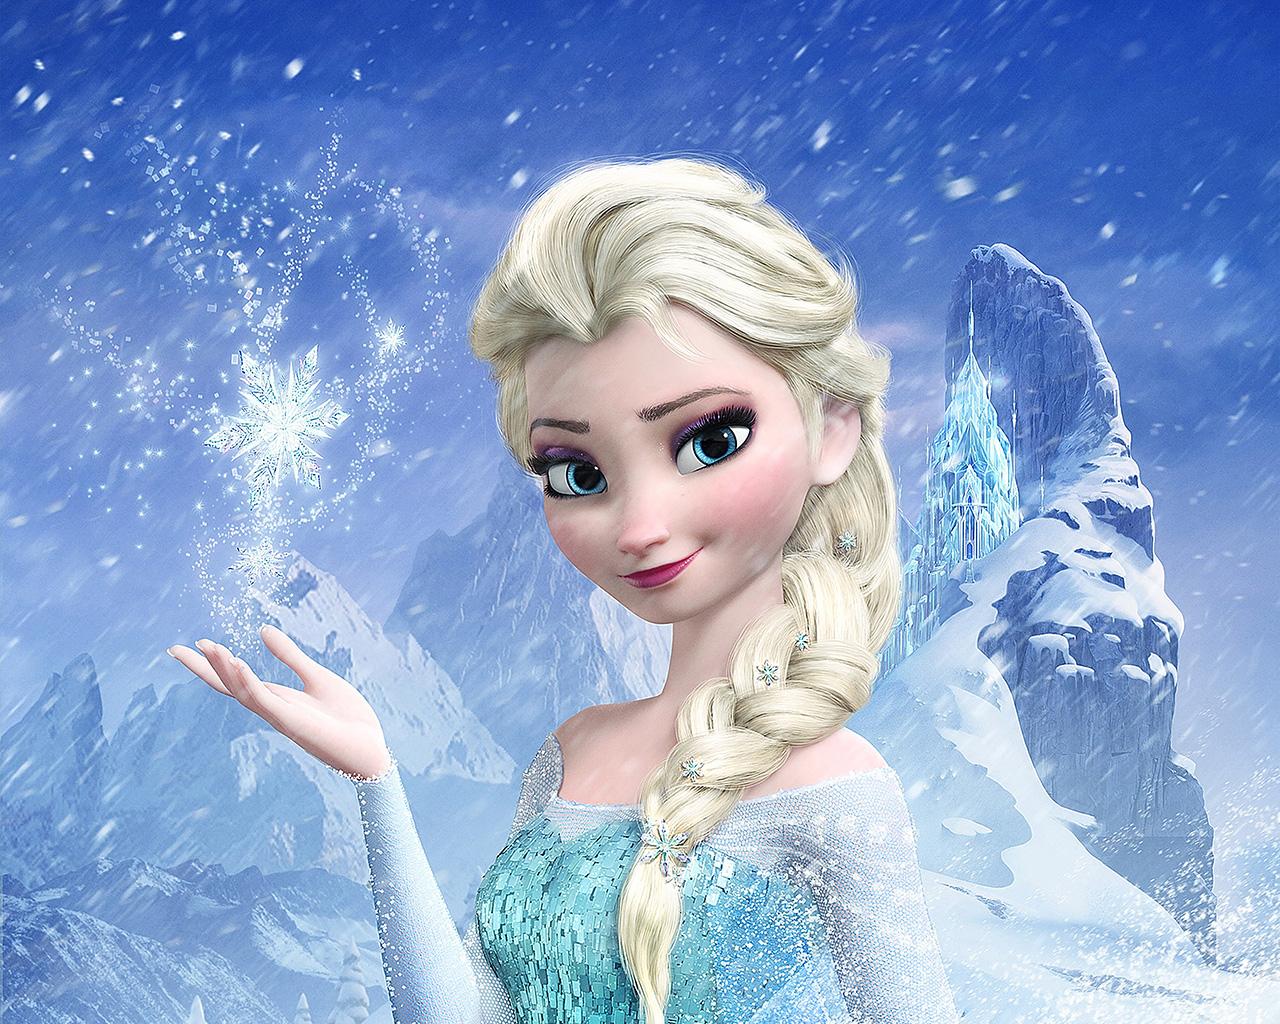 Transparent Anna And Elsa Wallpaper In The Frozen Club Elsa Y Anna